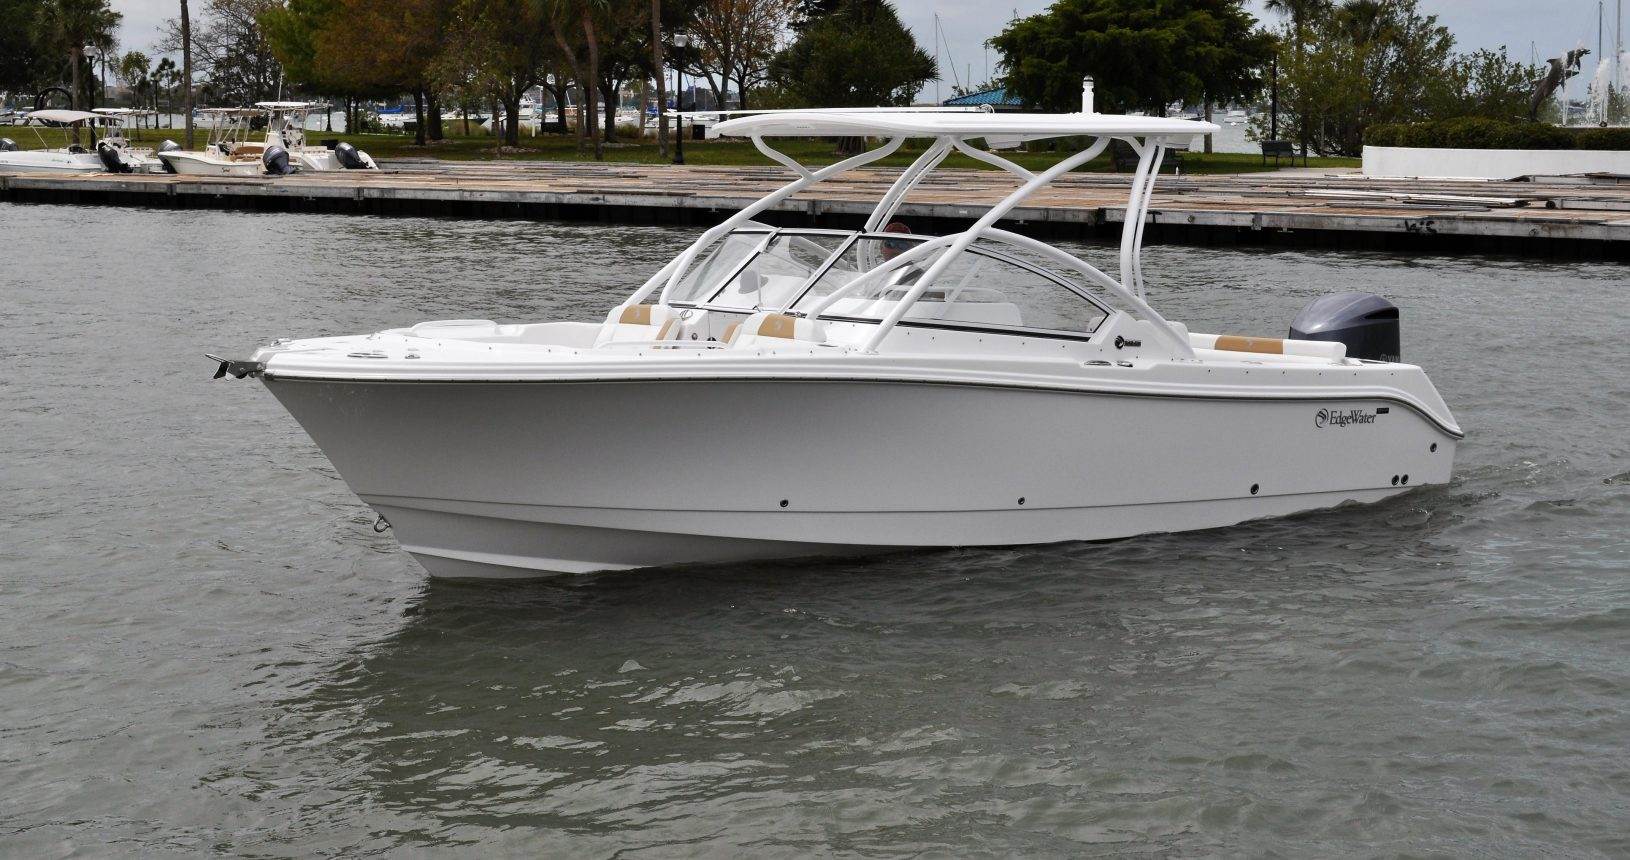 Edgewater 248CX for sale - Profile